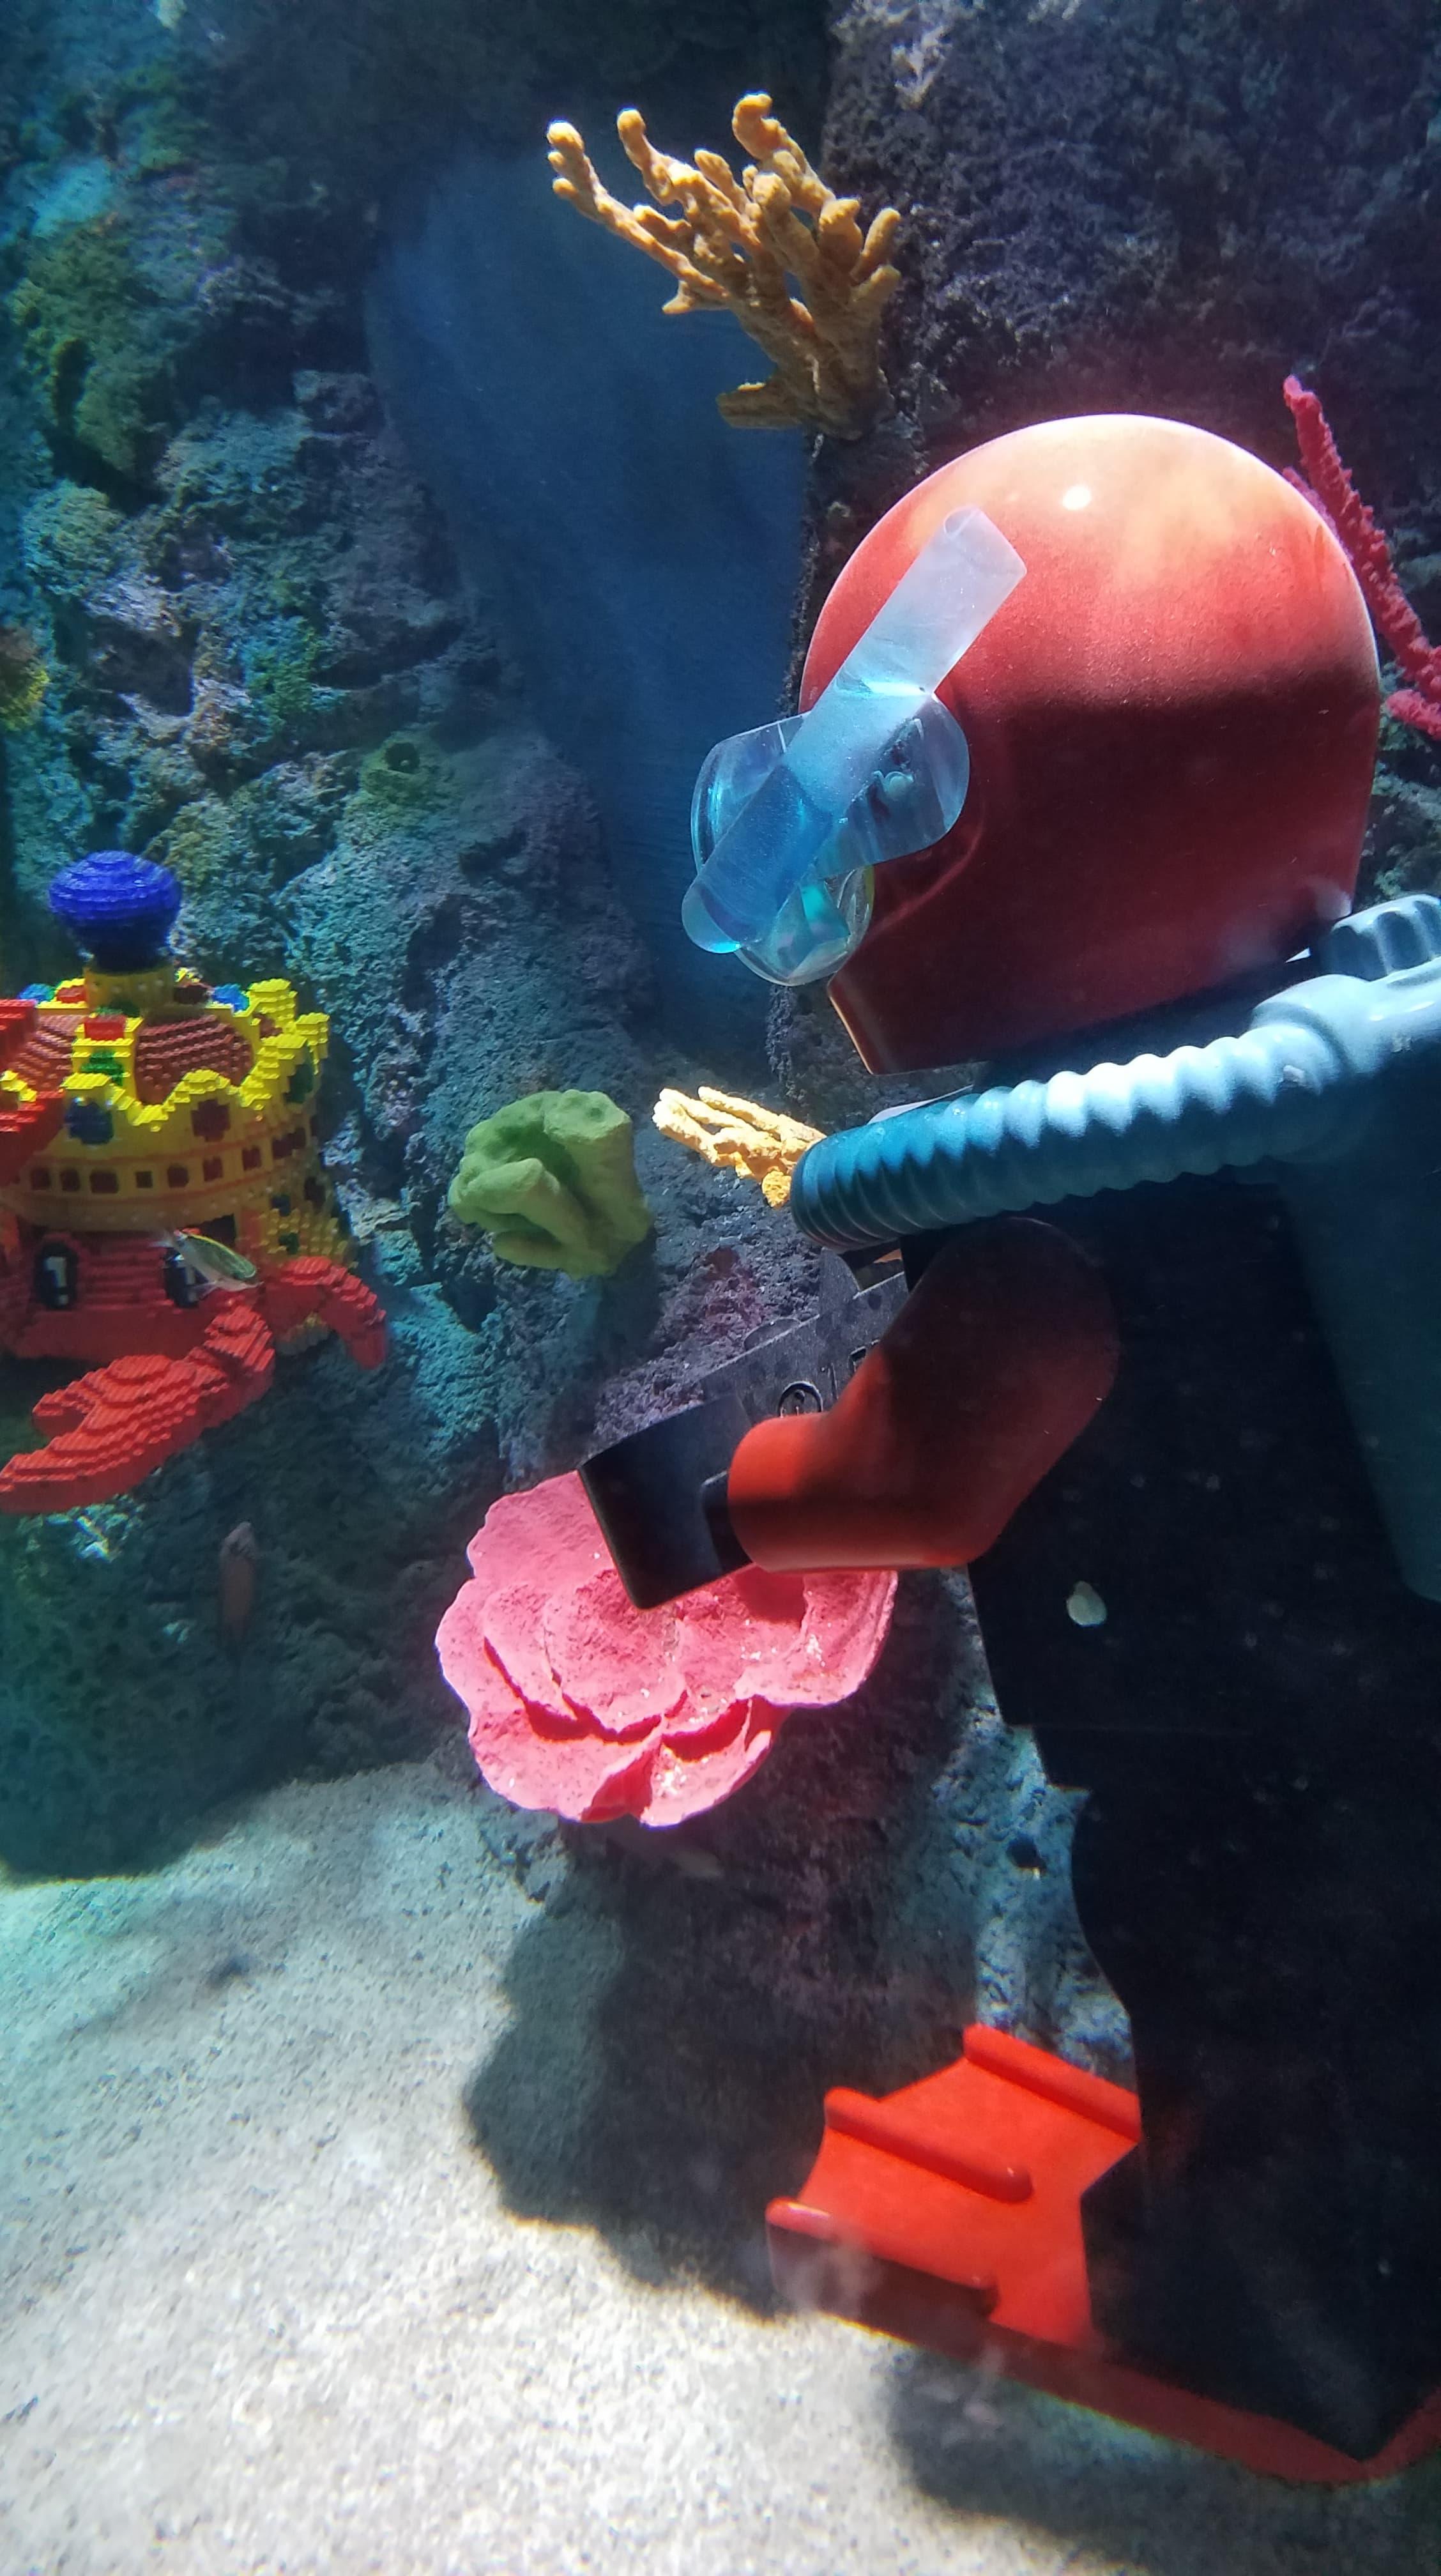 Lego City: Deep Sea Adventure Submarine Ride Takes its ...